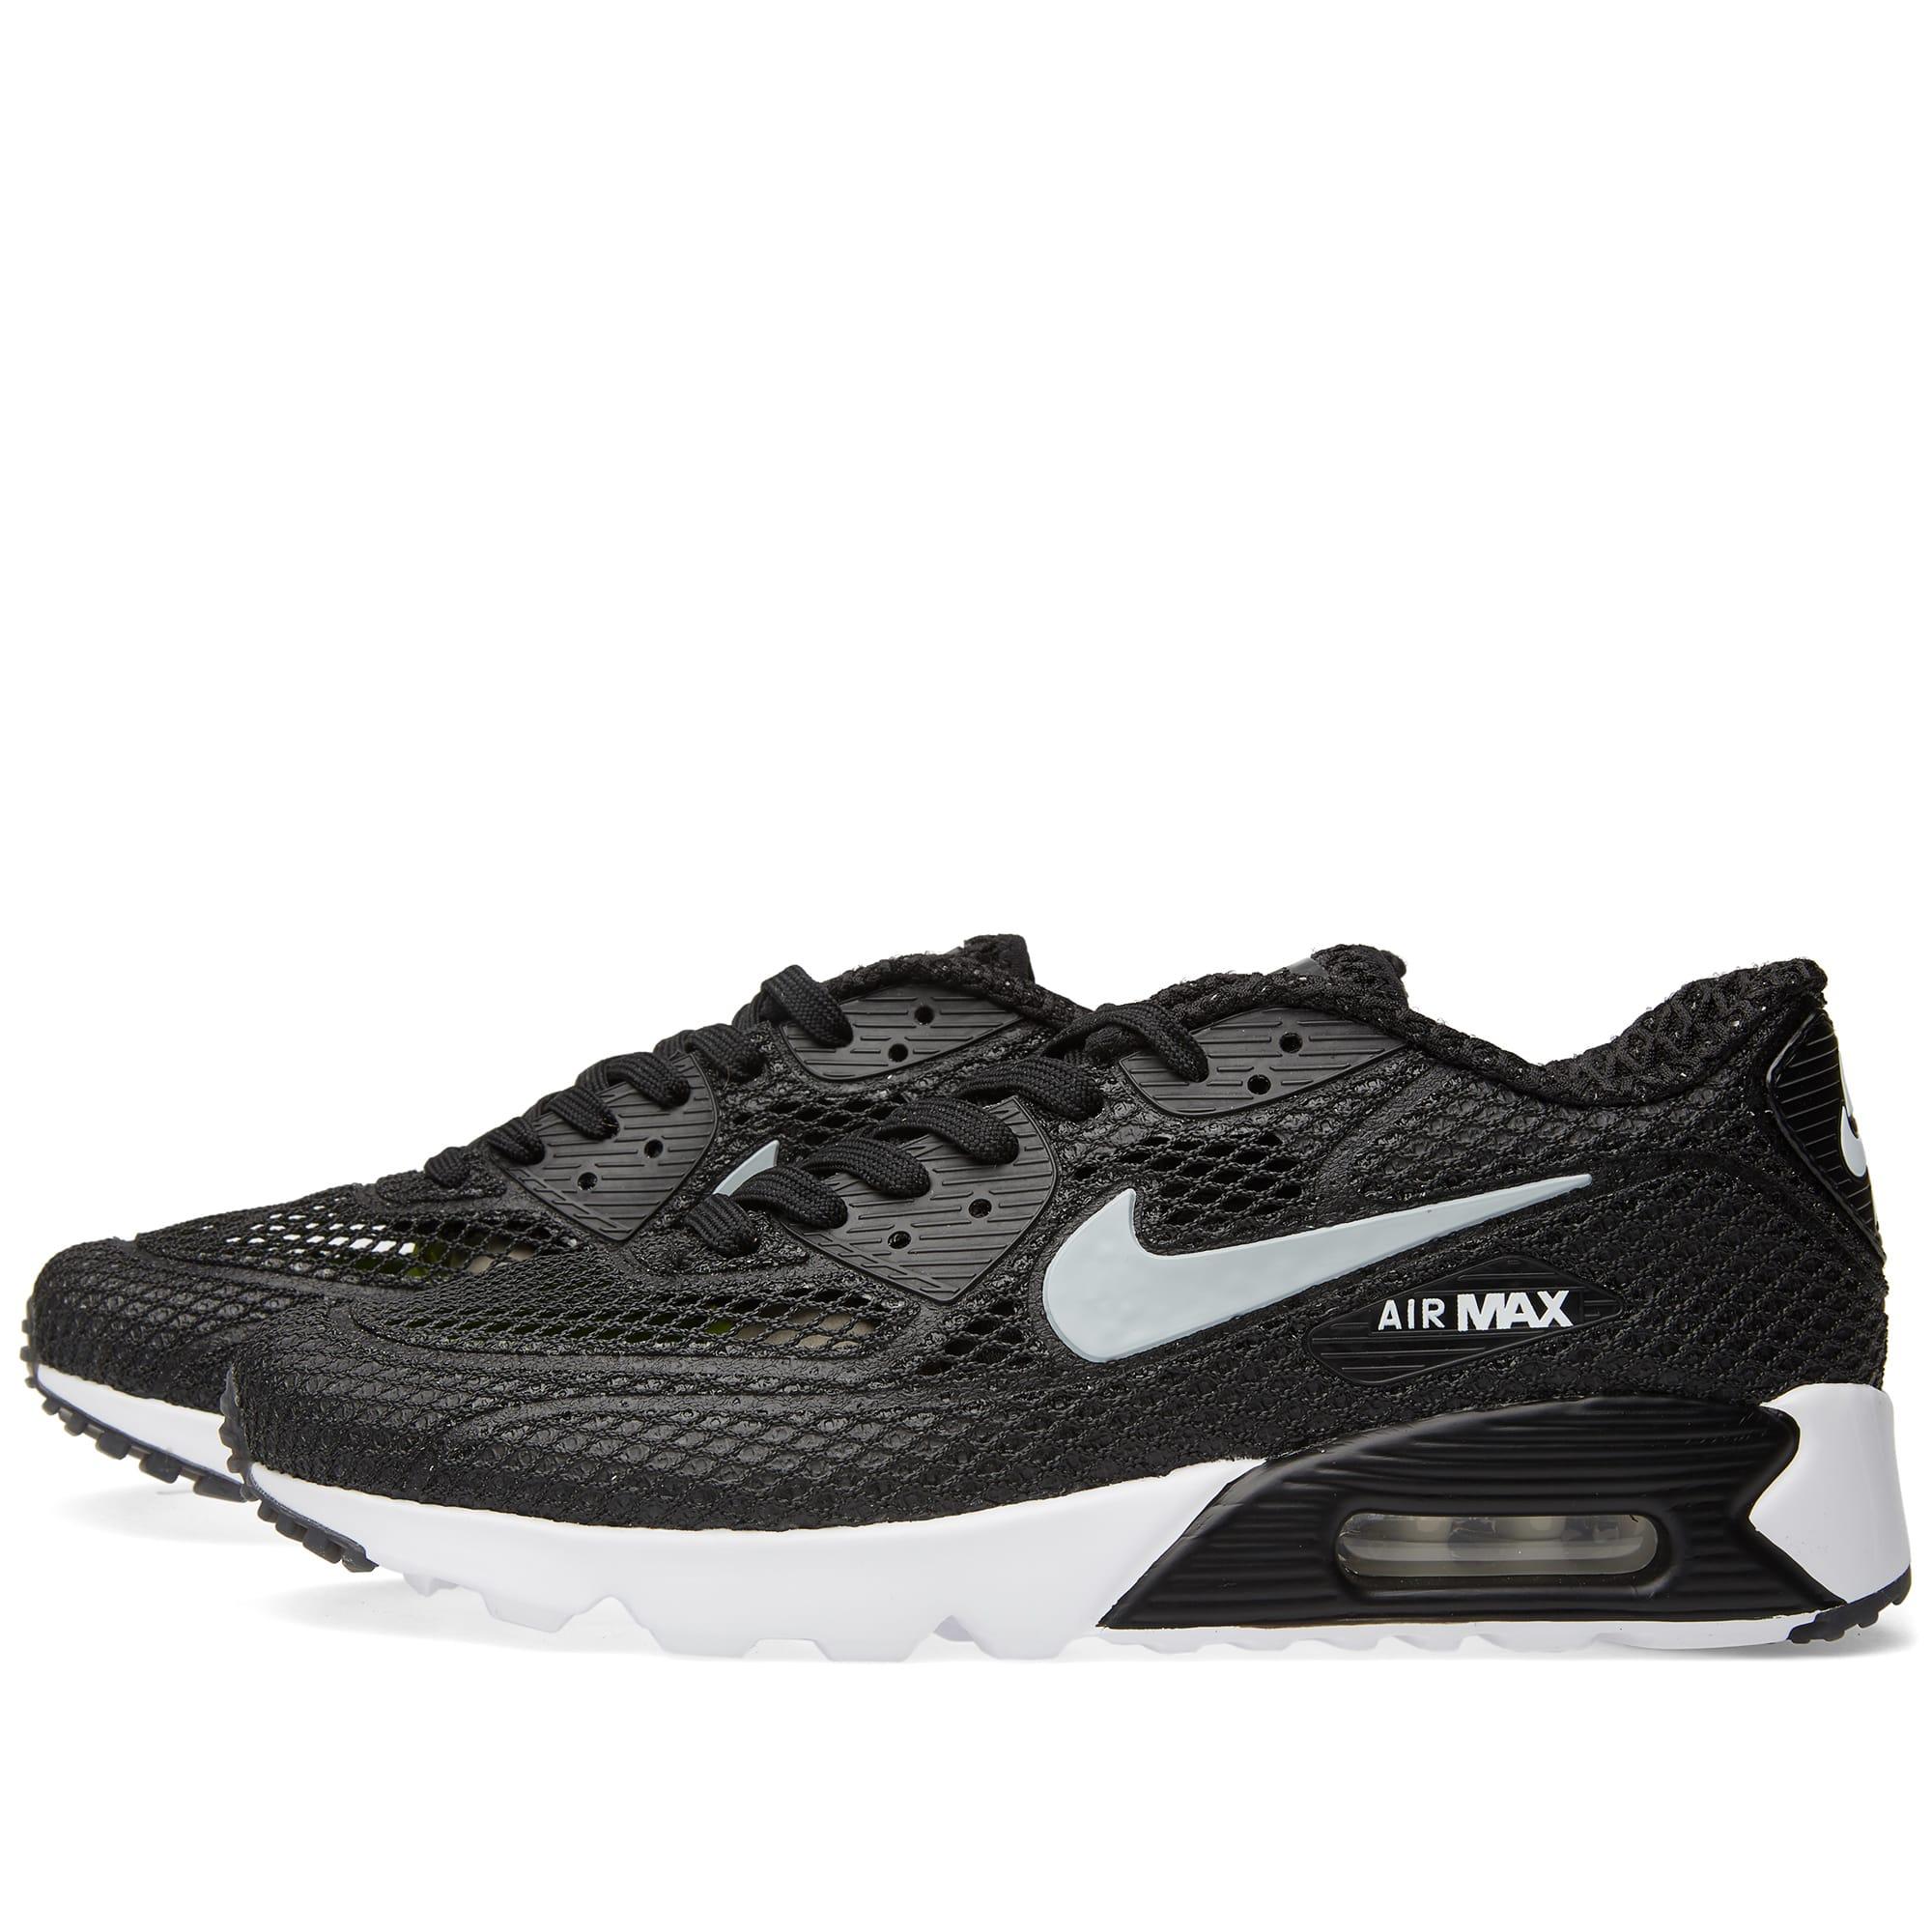 Nike Air Max 90 Ultra BR PLUS QS Black, Men's Fashion